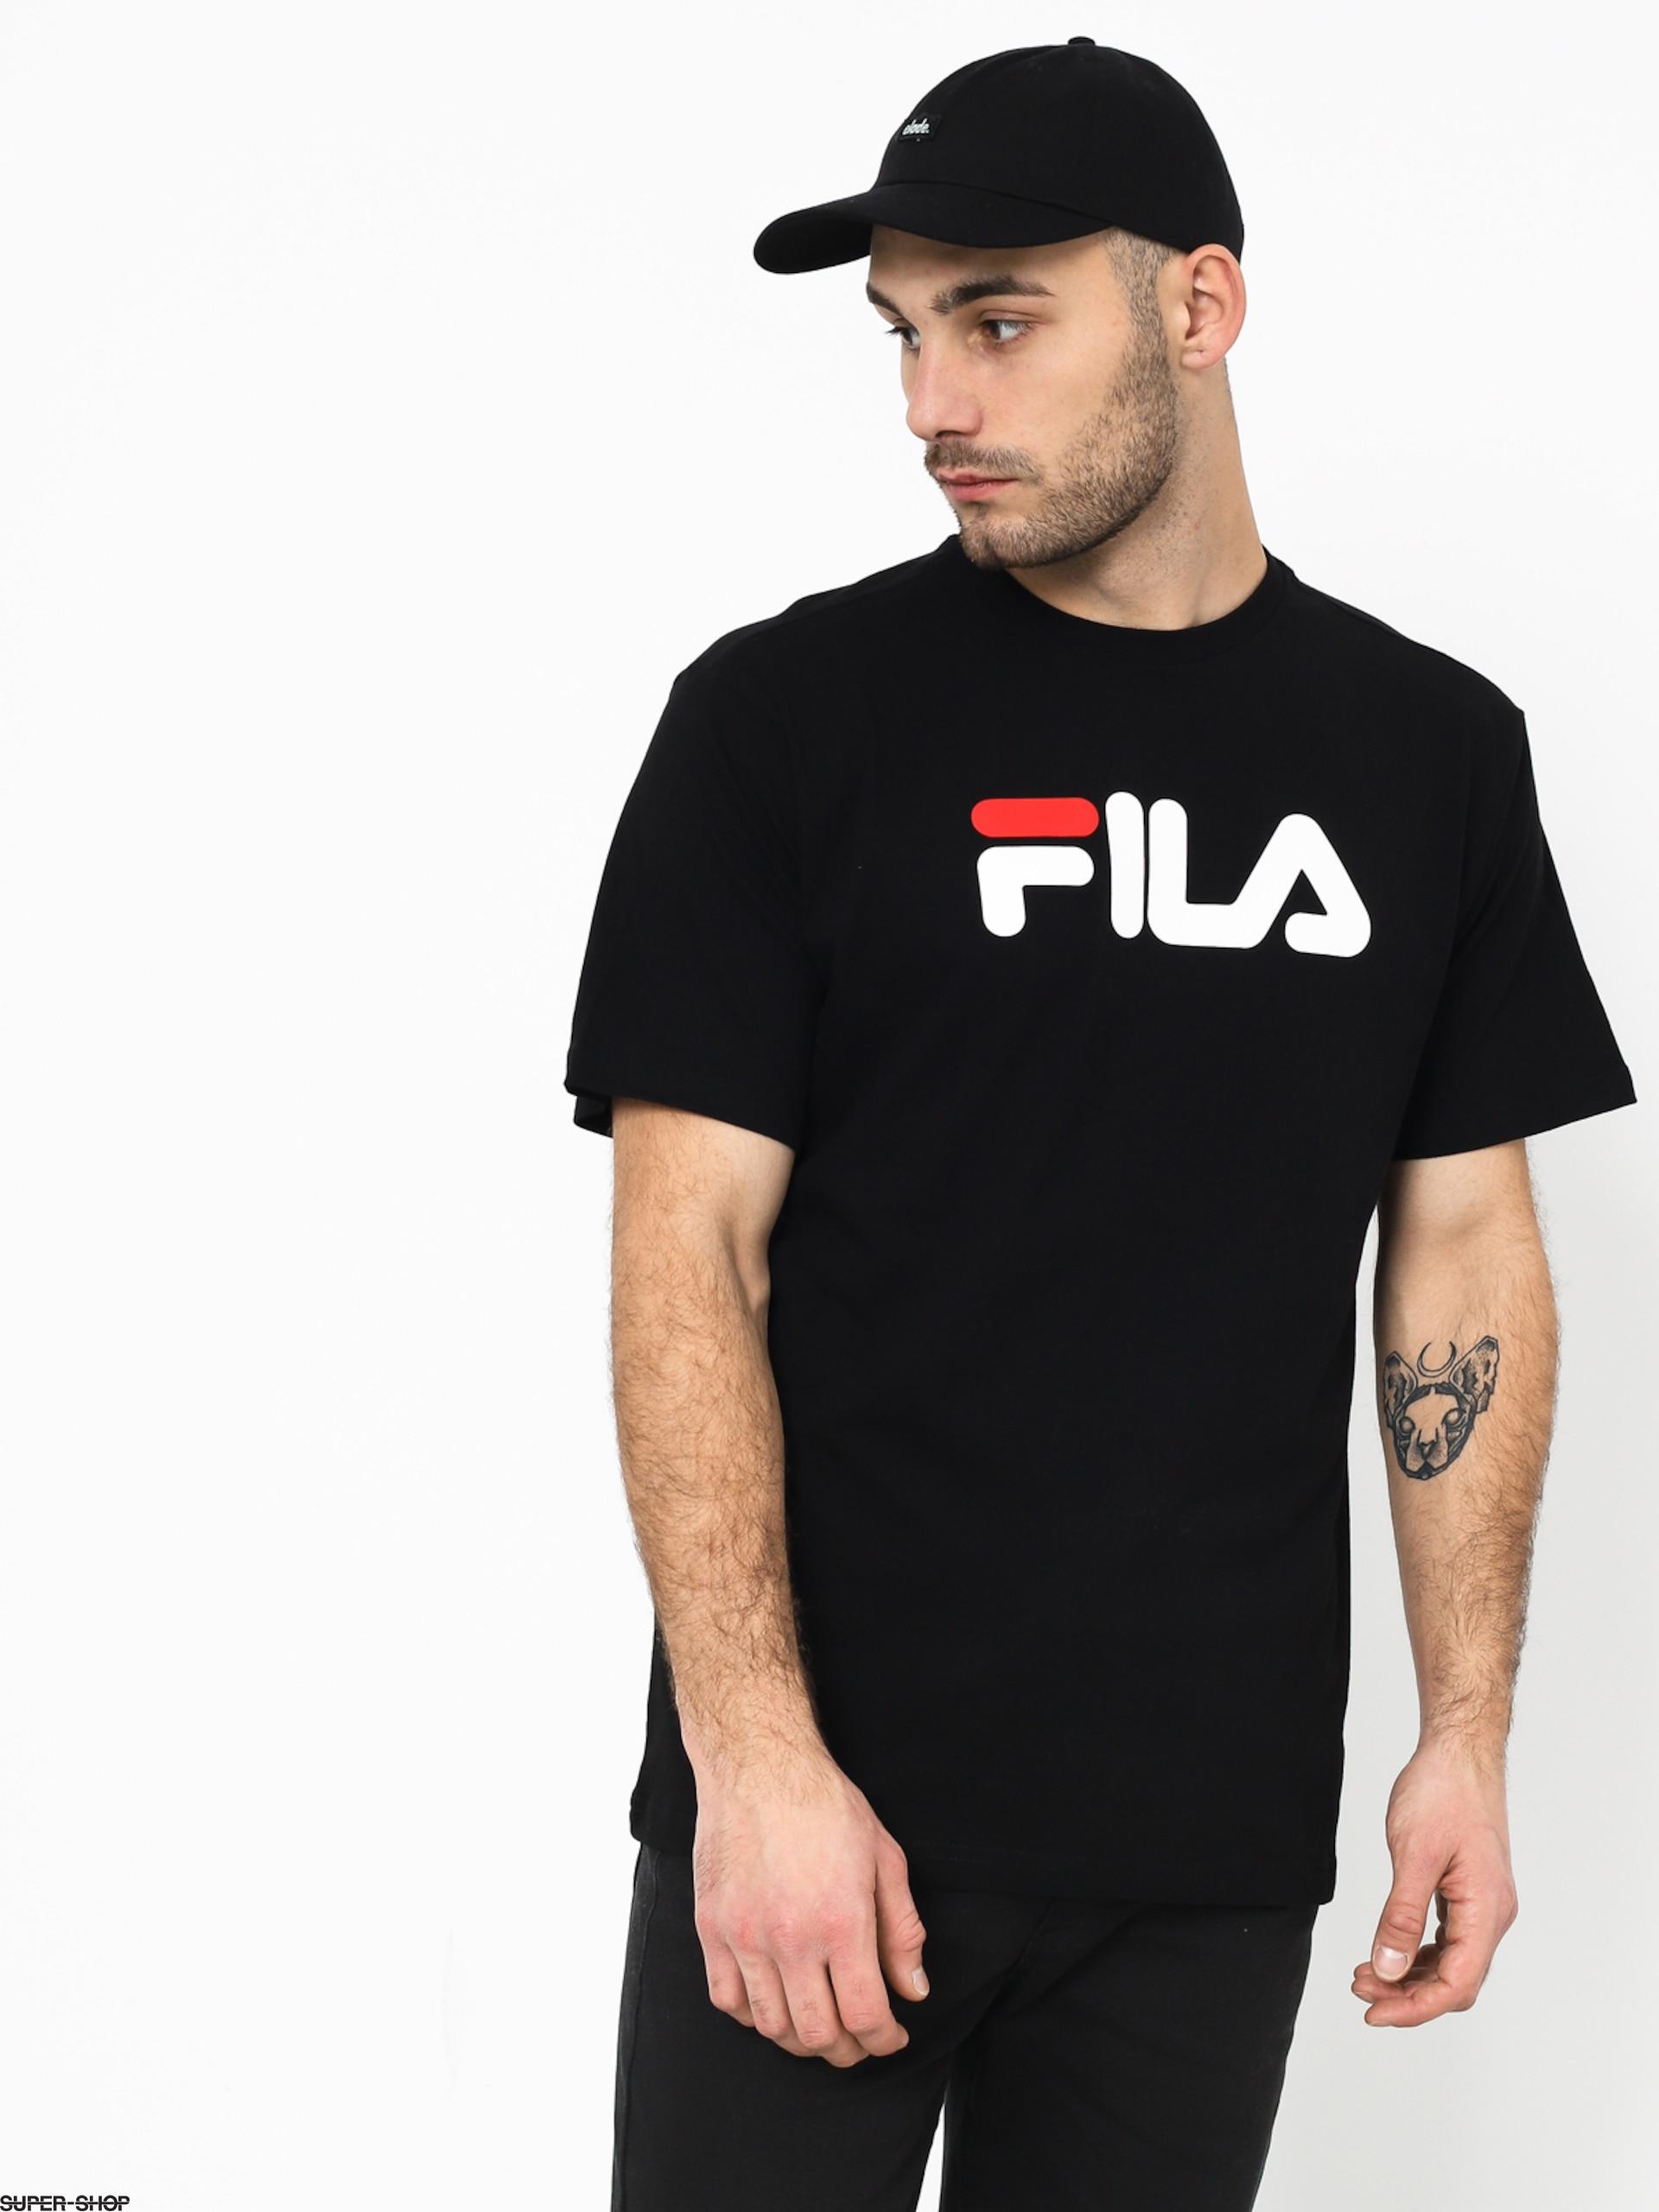 da9462d2 992514-w1920-fila-pure-short-sleeve-shirt-tshirt-black.jpg